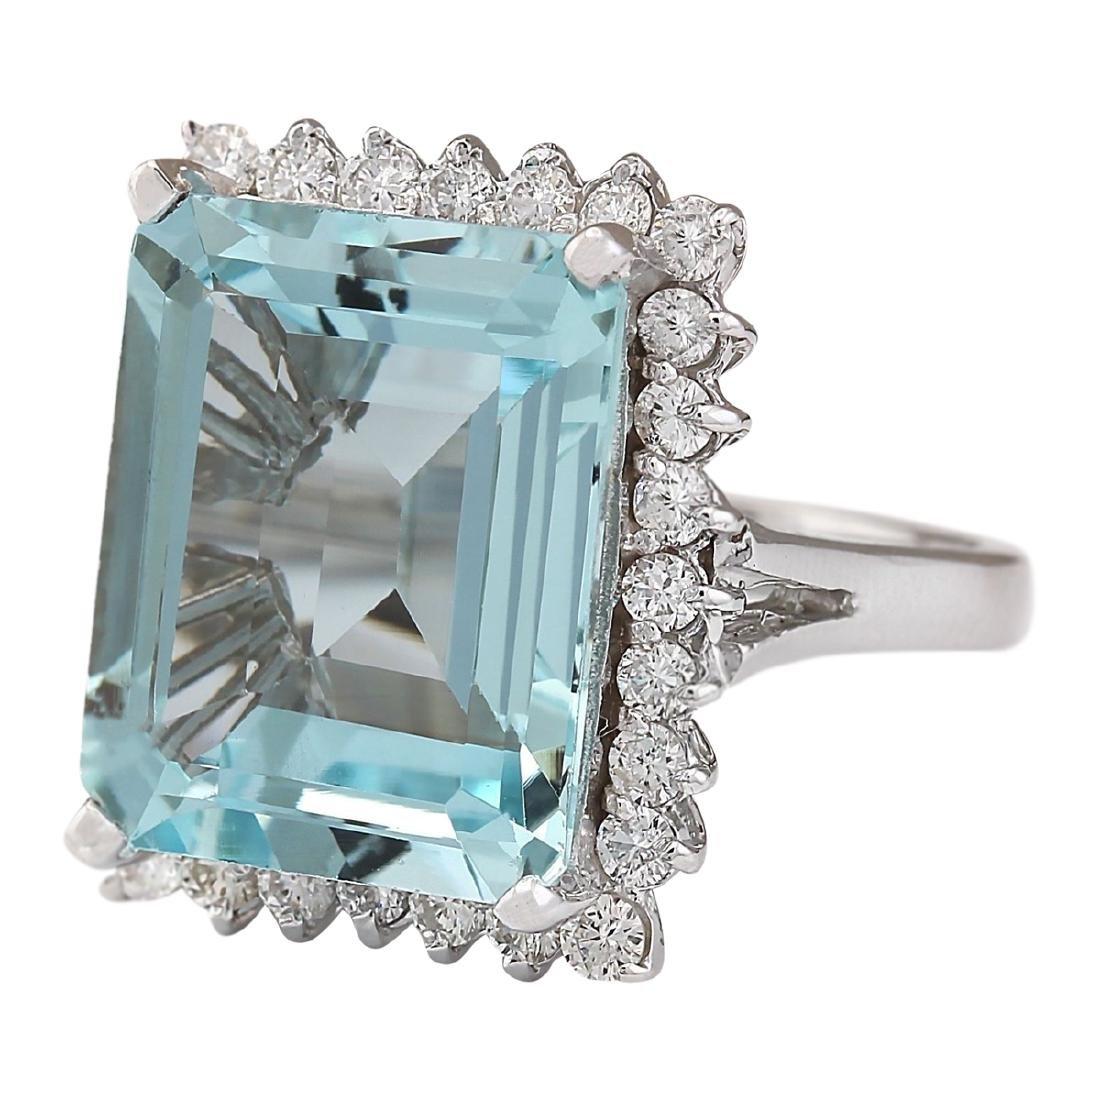 12.29 CTW Natural Aquamarine And Diamond Ring In 18K - 2